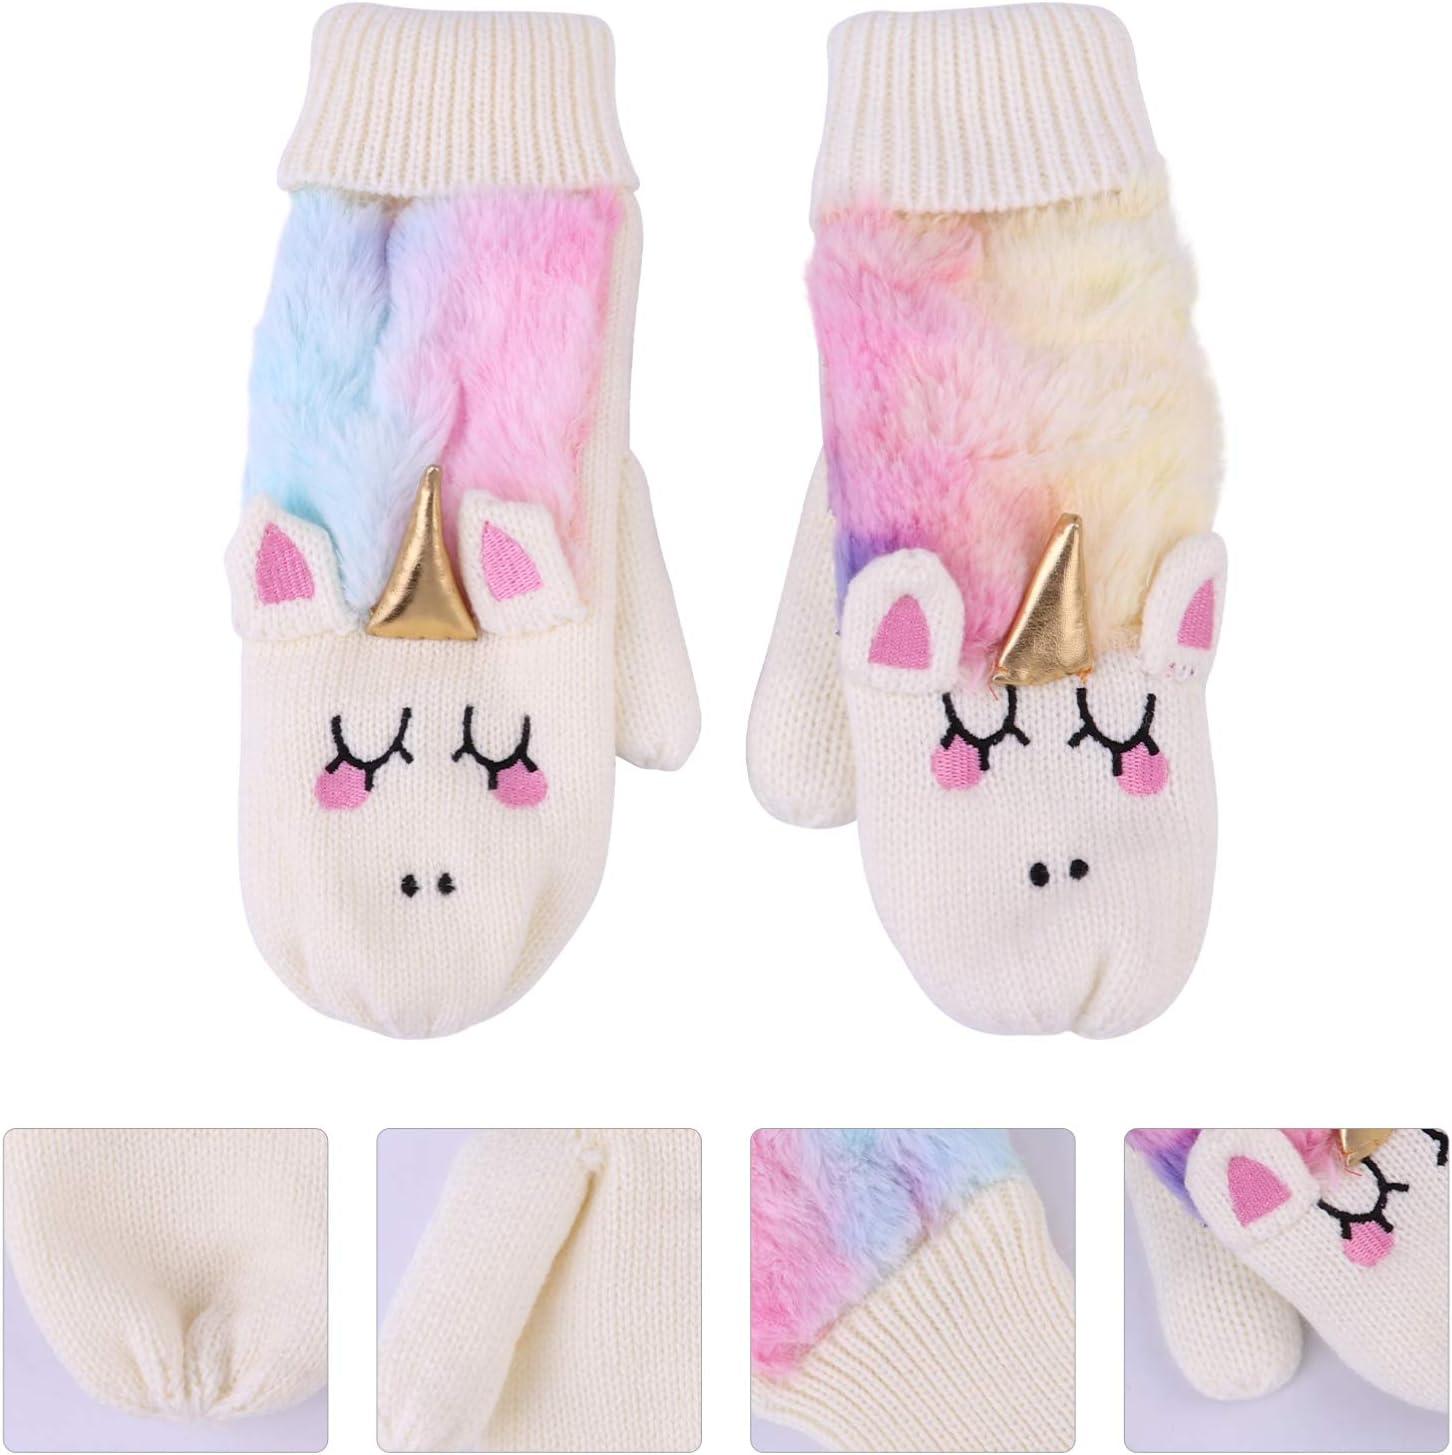 VALICLUD 1 Pair Unicorn Mitten Gloves Tie Dye Winter Gloves Warm Lining Cozy Knit Faux Fur Rainbow Mitten